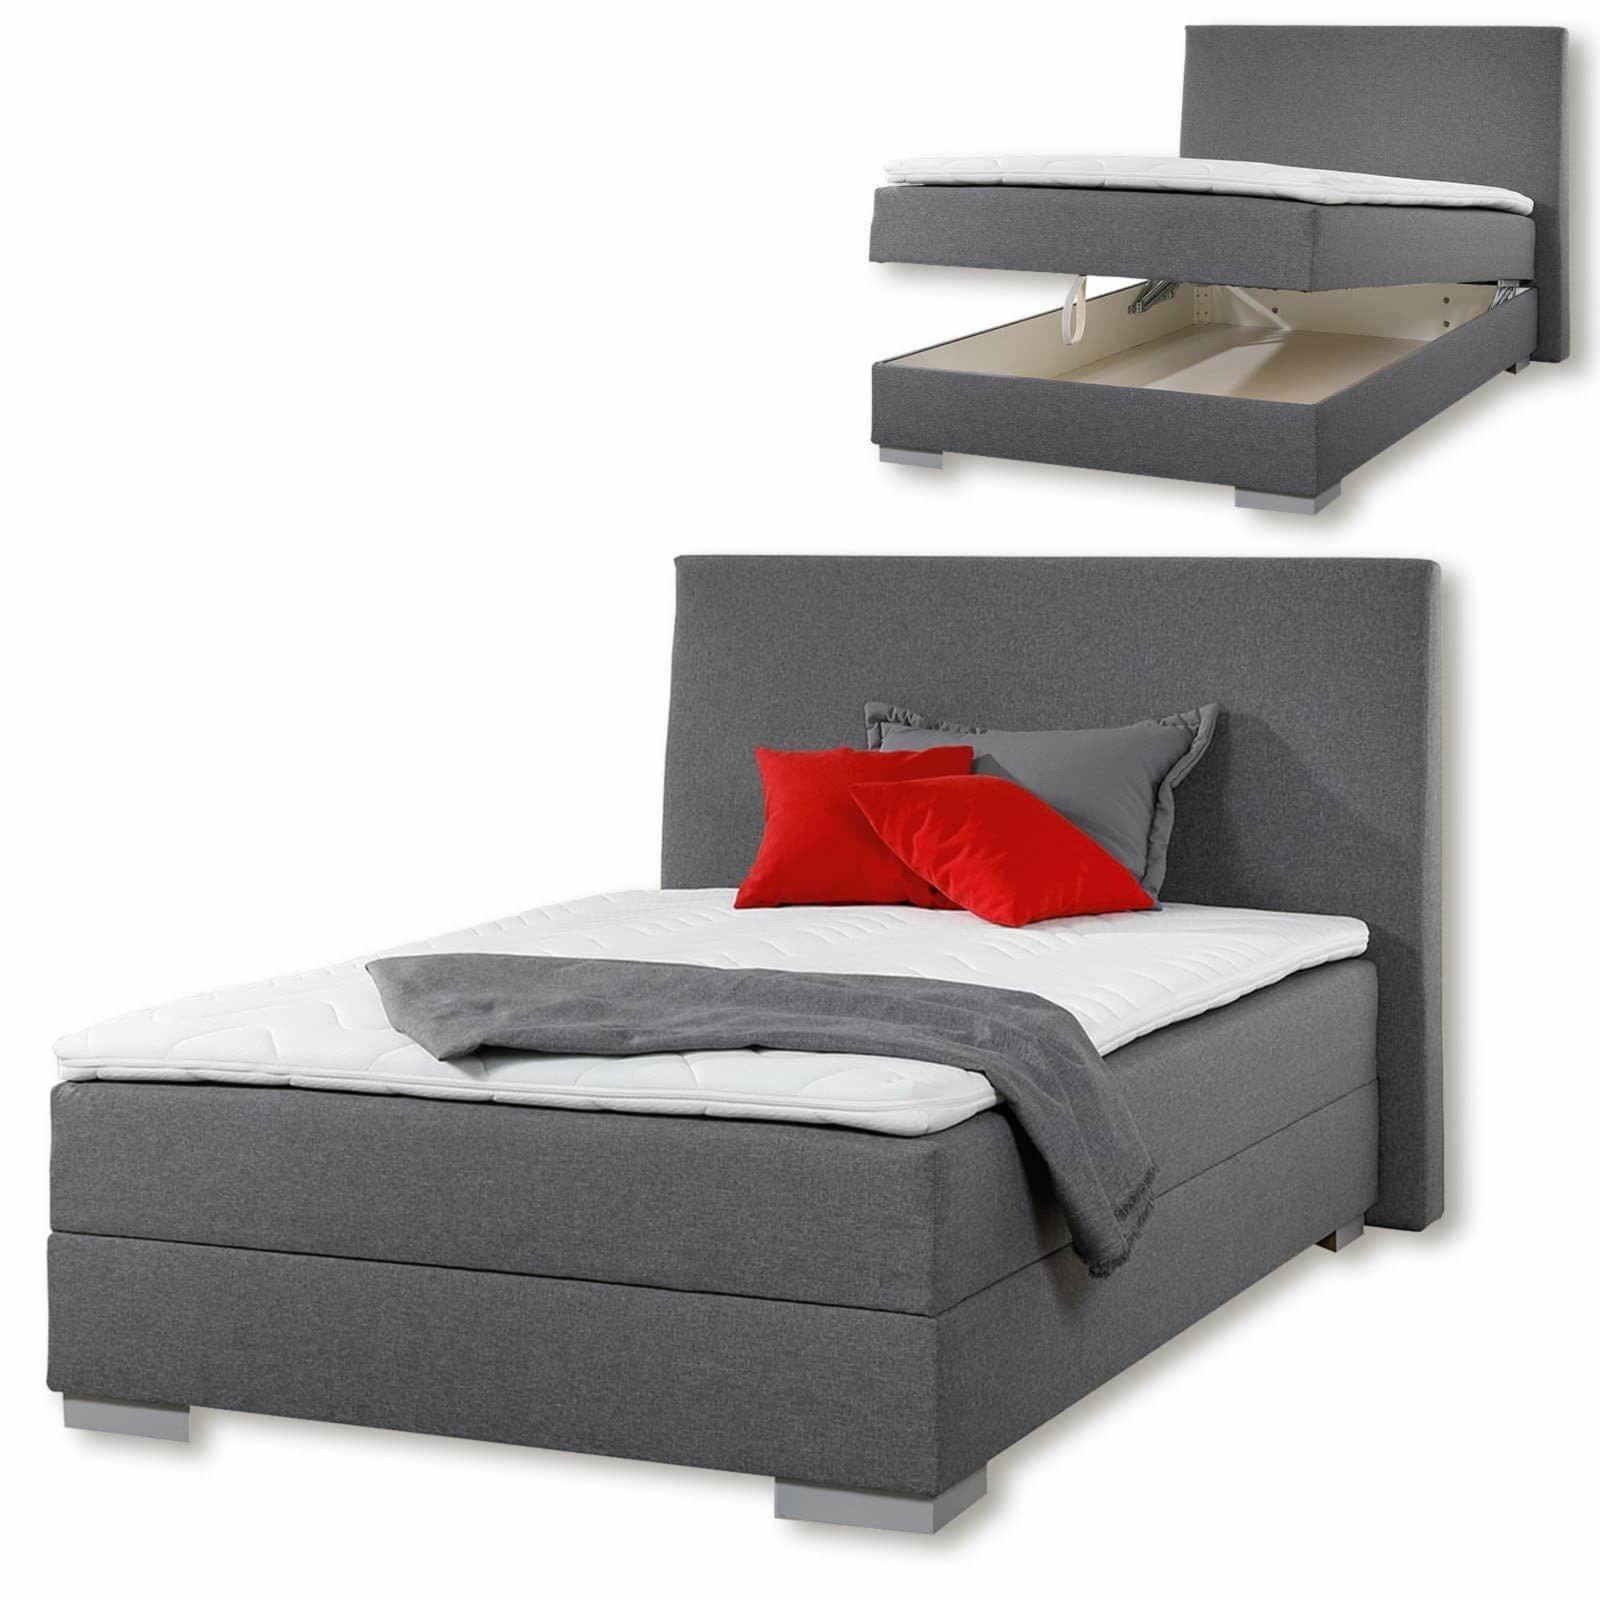 boxspringbett jumper grau h2 120x200 cm ebay. Black Bedroom Furniture Sets. Home Design Ideas